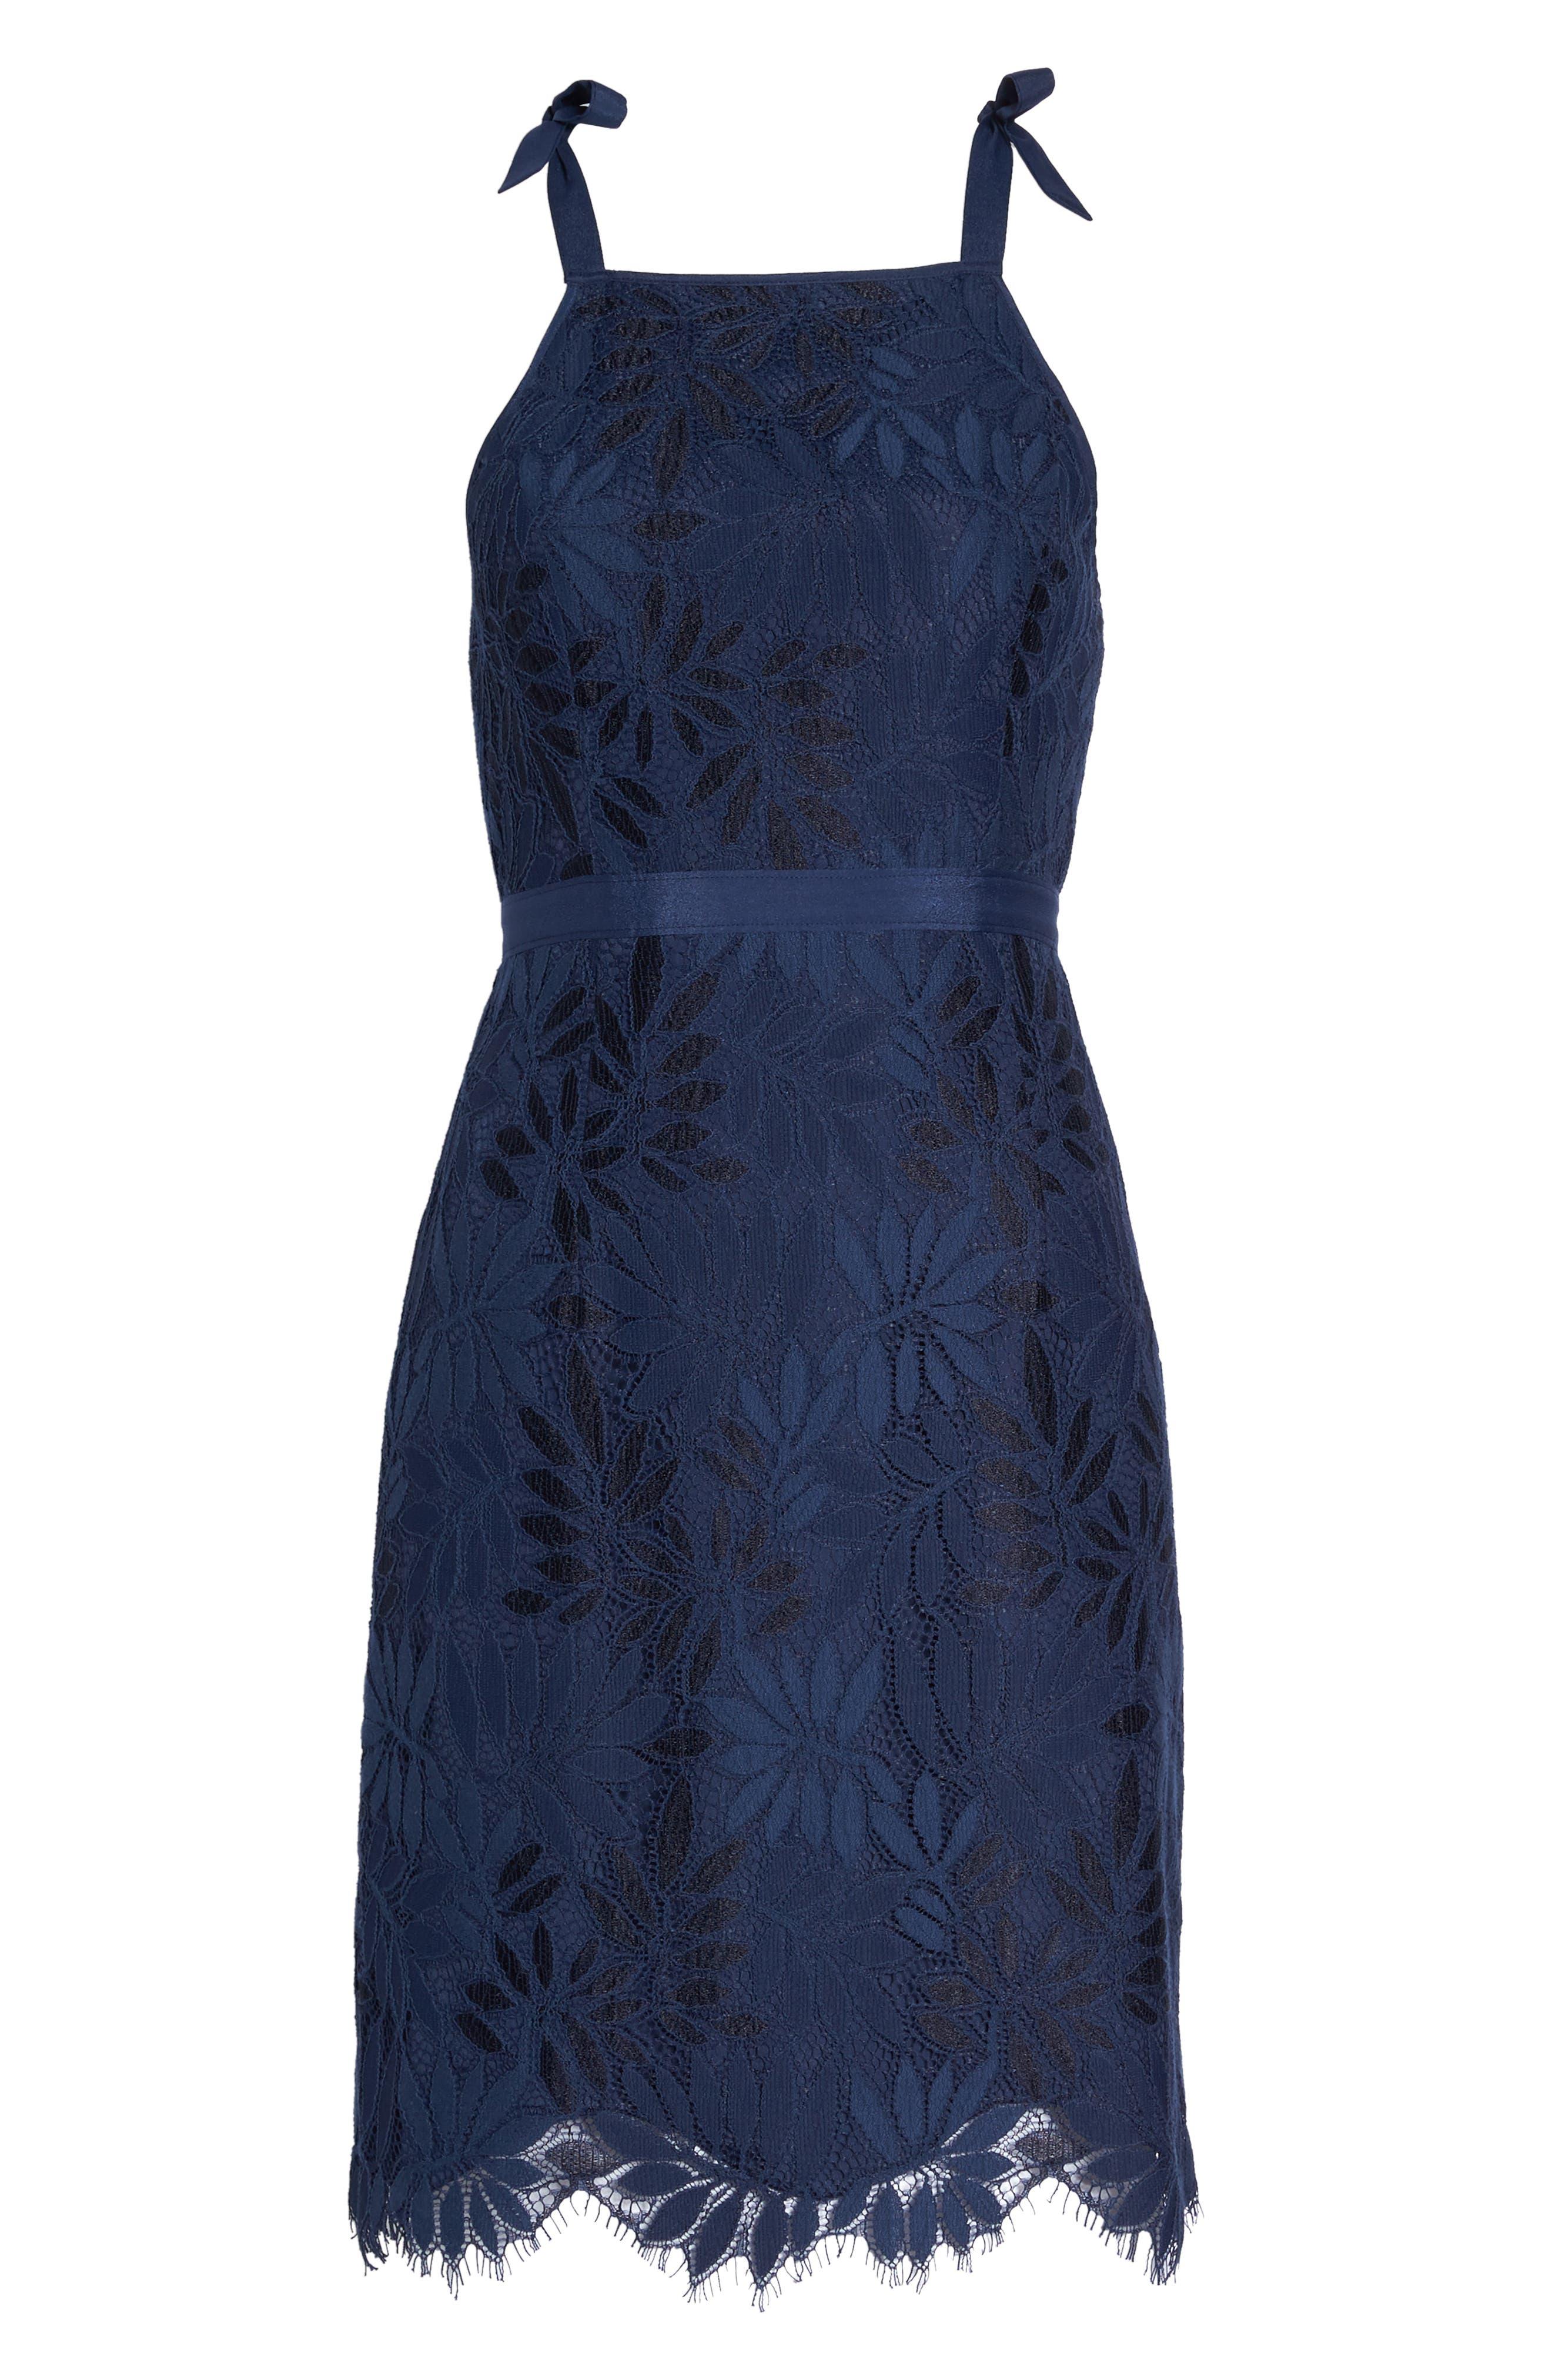 Lily Pulitzer<sup>®</sup> Jamie One-Shoulder Dress,                             Alternate thumbnail 6, color,                             TRUE NAVY